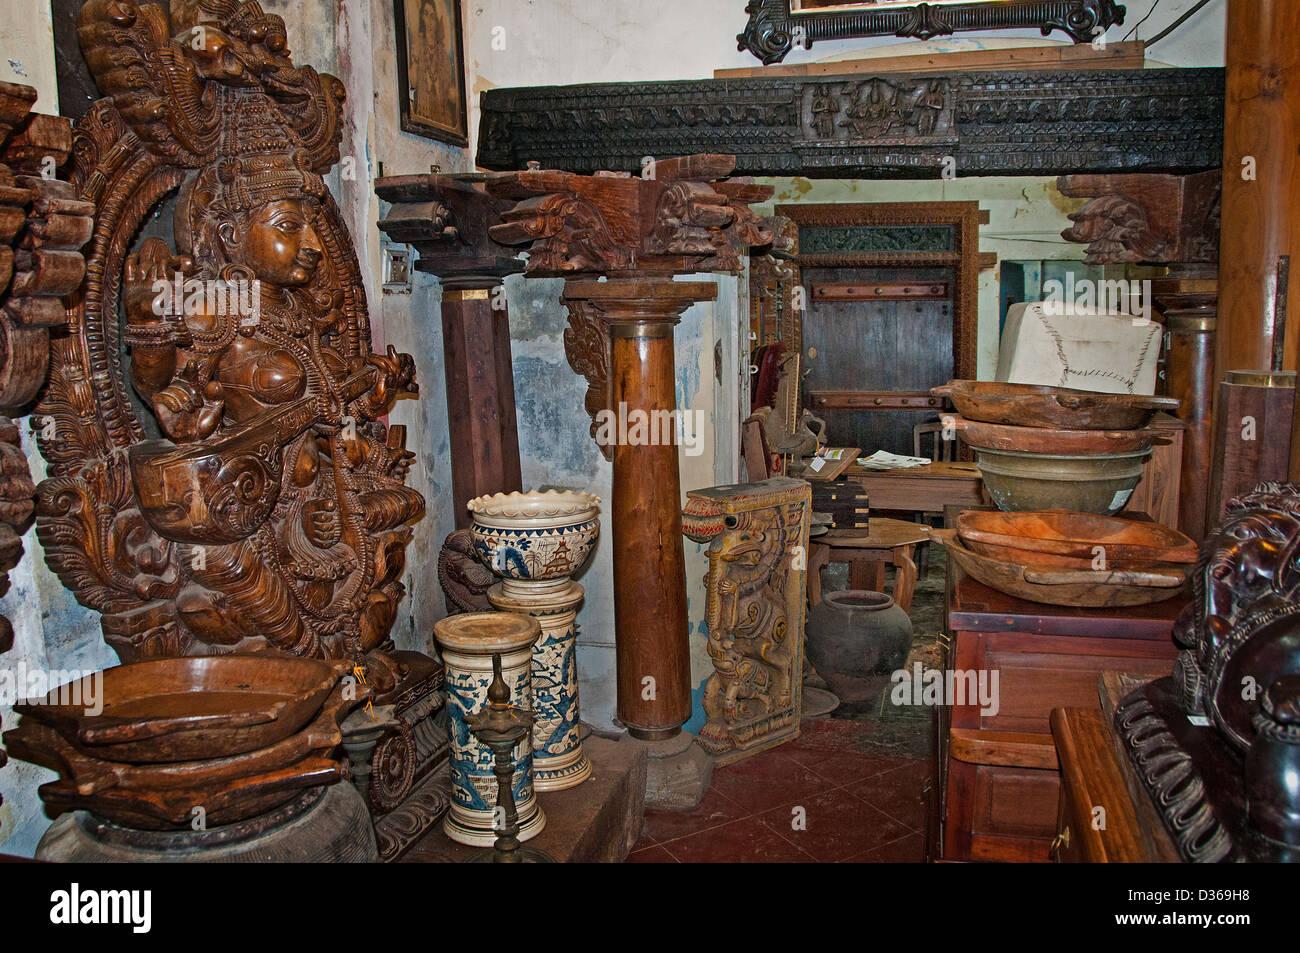 Antique Shop Tavikneswaran Geerhanjaky Puducherry ( Pondicherry ) India  Tamil Nadu - Stock Image - Tinware Shop Stock Photos & Tinware Shop Stock Images - Alamy